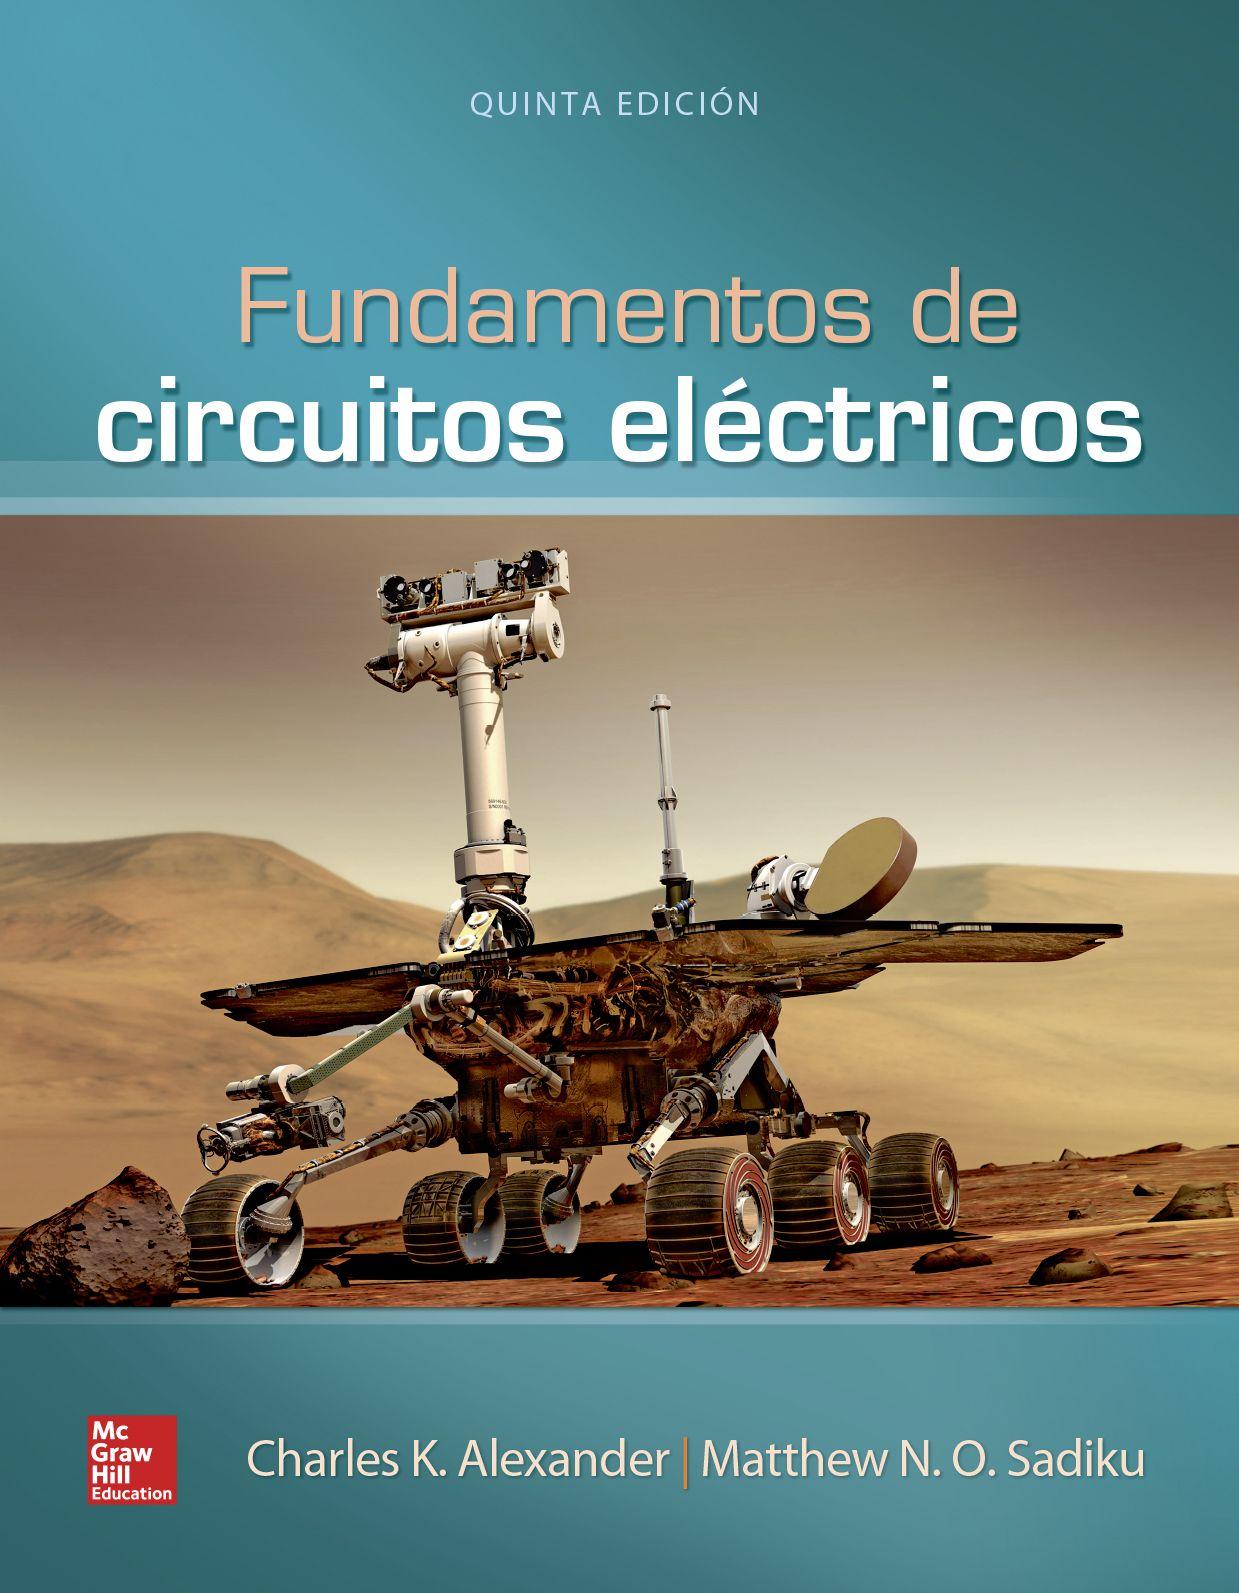 Fundamentos De Circuitos Electricos Charles K. Alexander Pdf